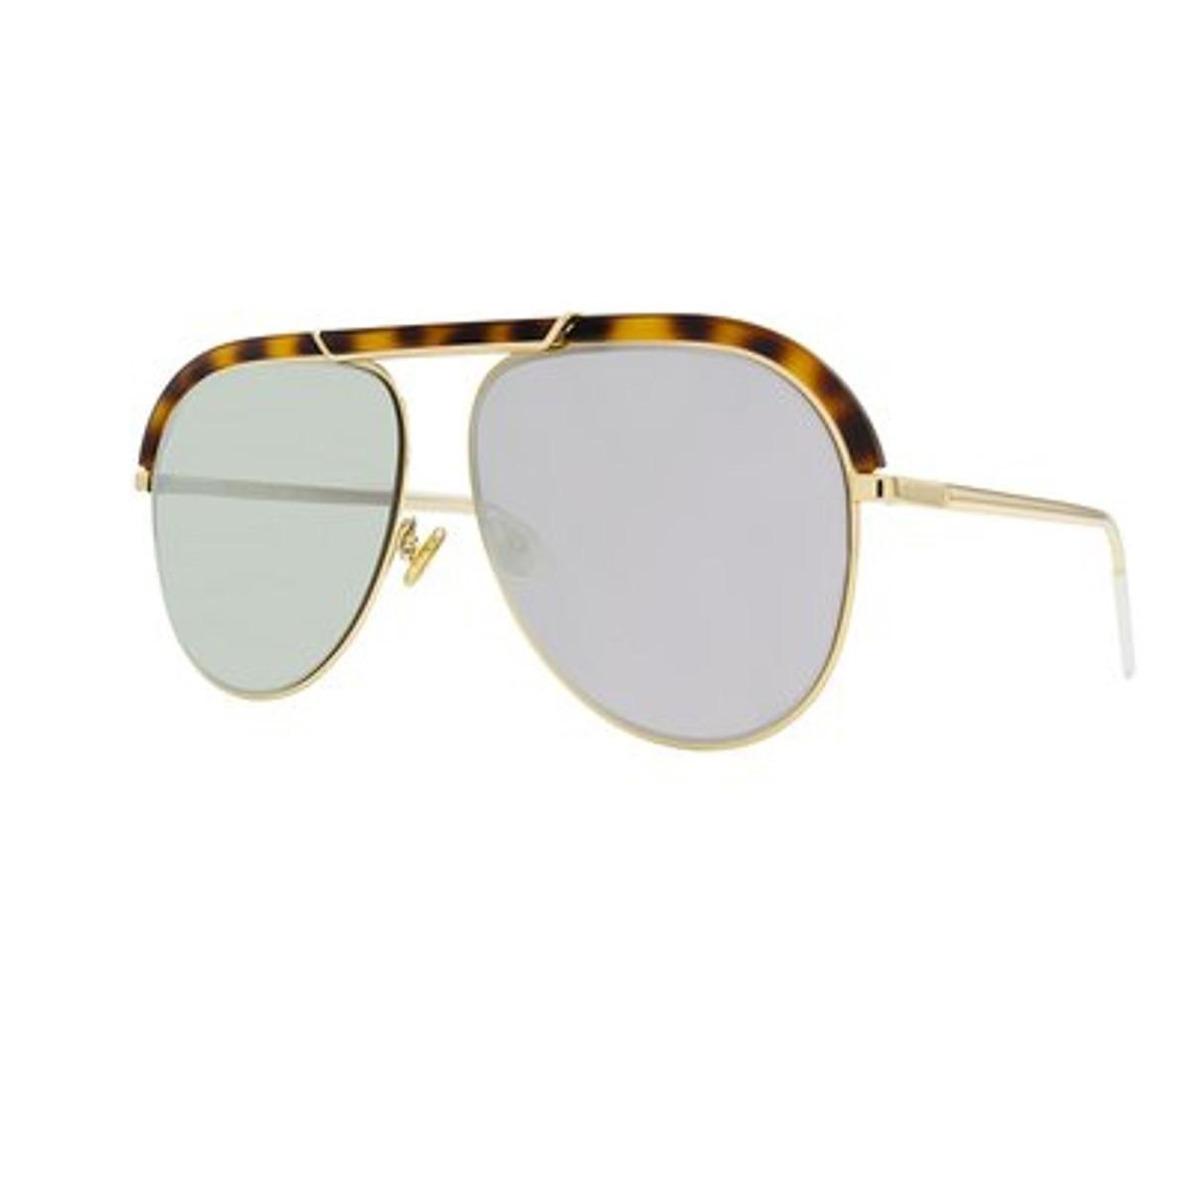 b7472362a8 Lentes Dior Desertic 2ik0t Dorado, Carey; Plateado - $ 6,697.00 en ...